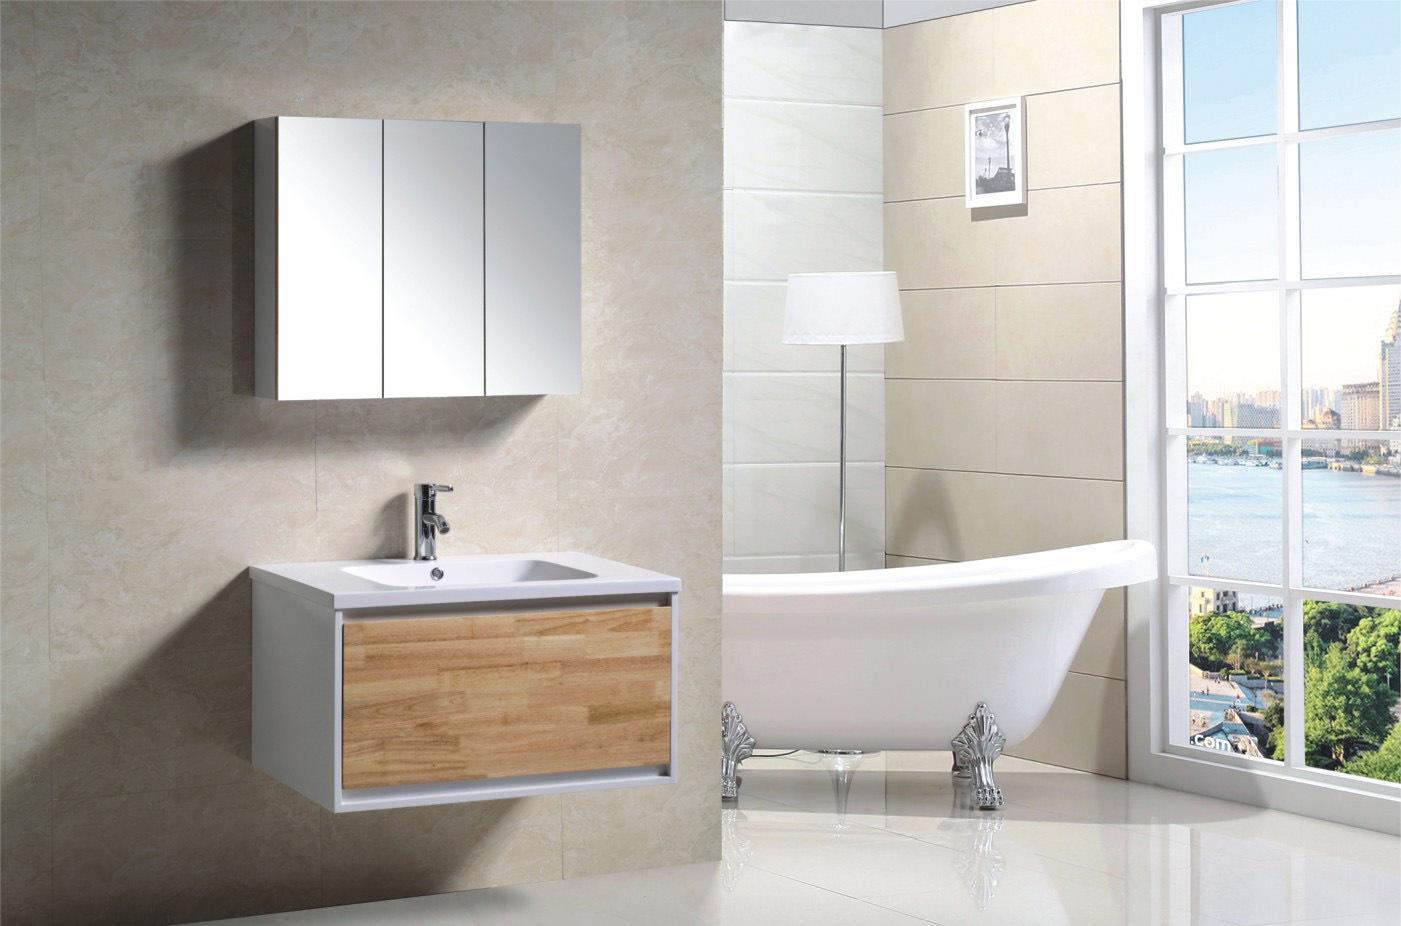 Dalle adhesive salle de bain mural maison design - Dalle adhesive salle de bain ...